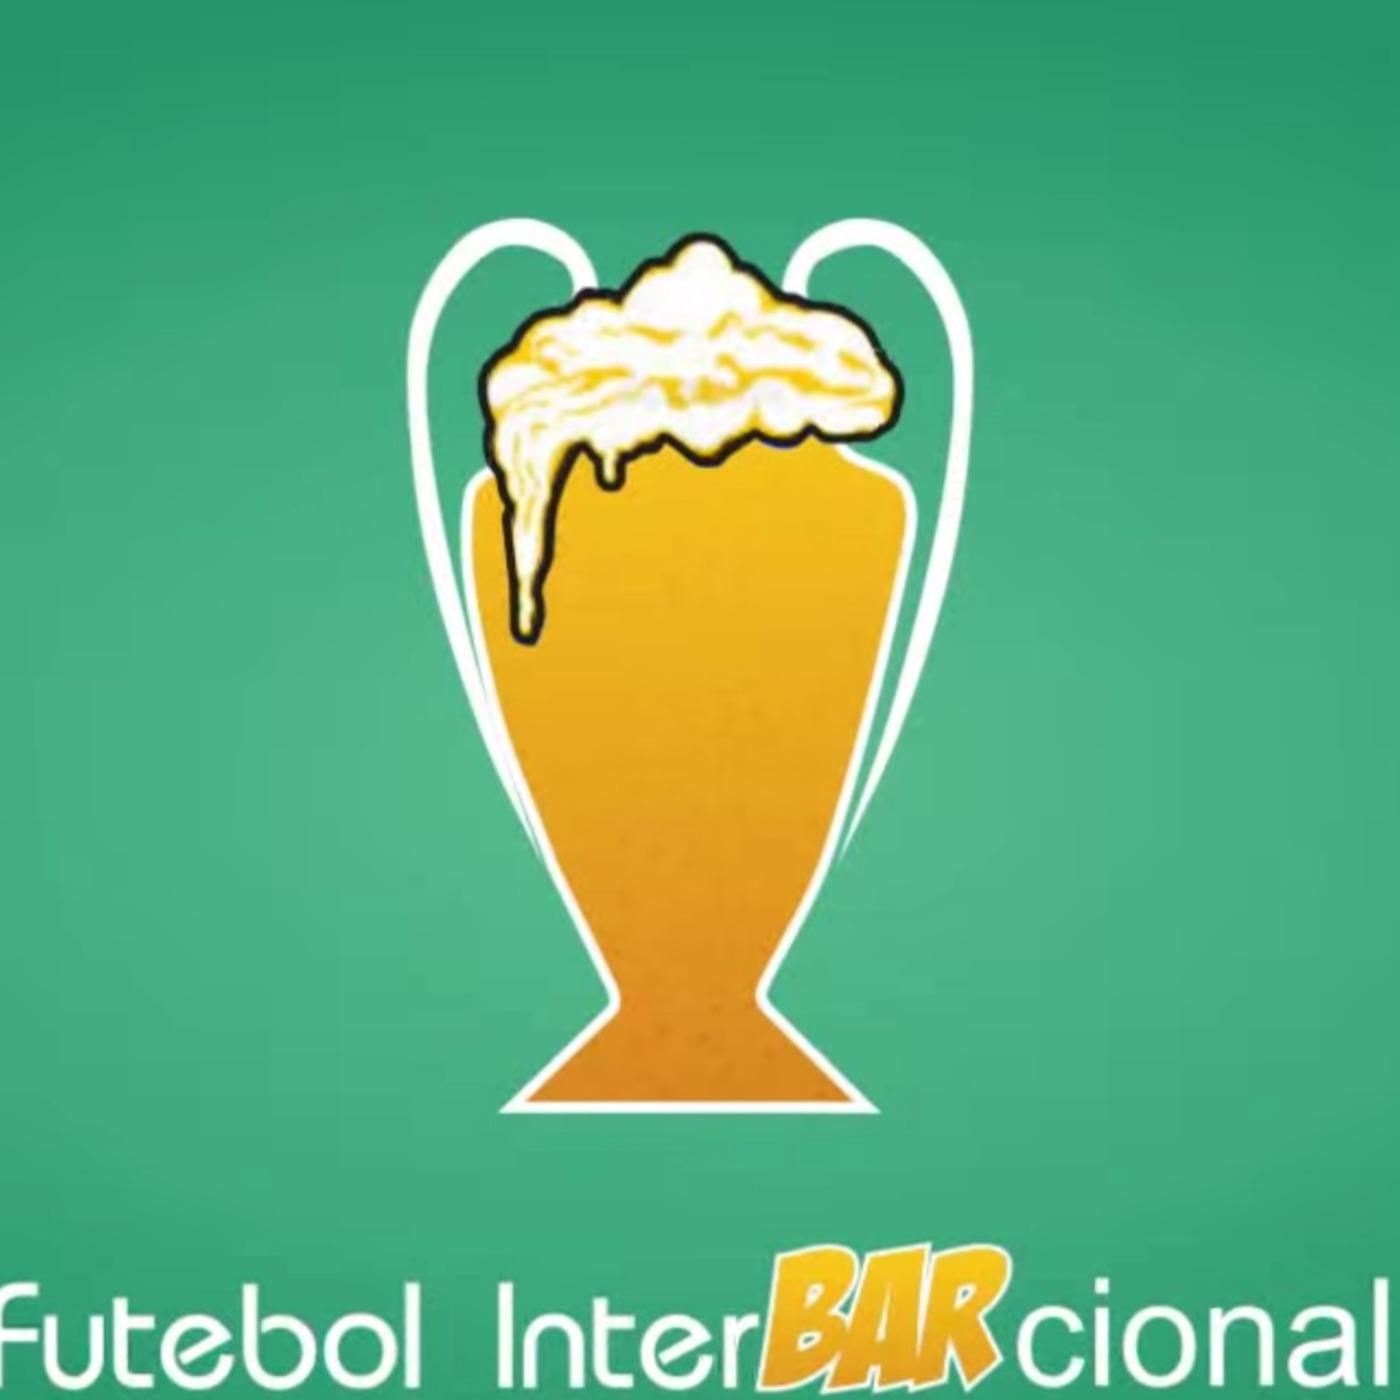 Futebol interBARcional